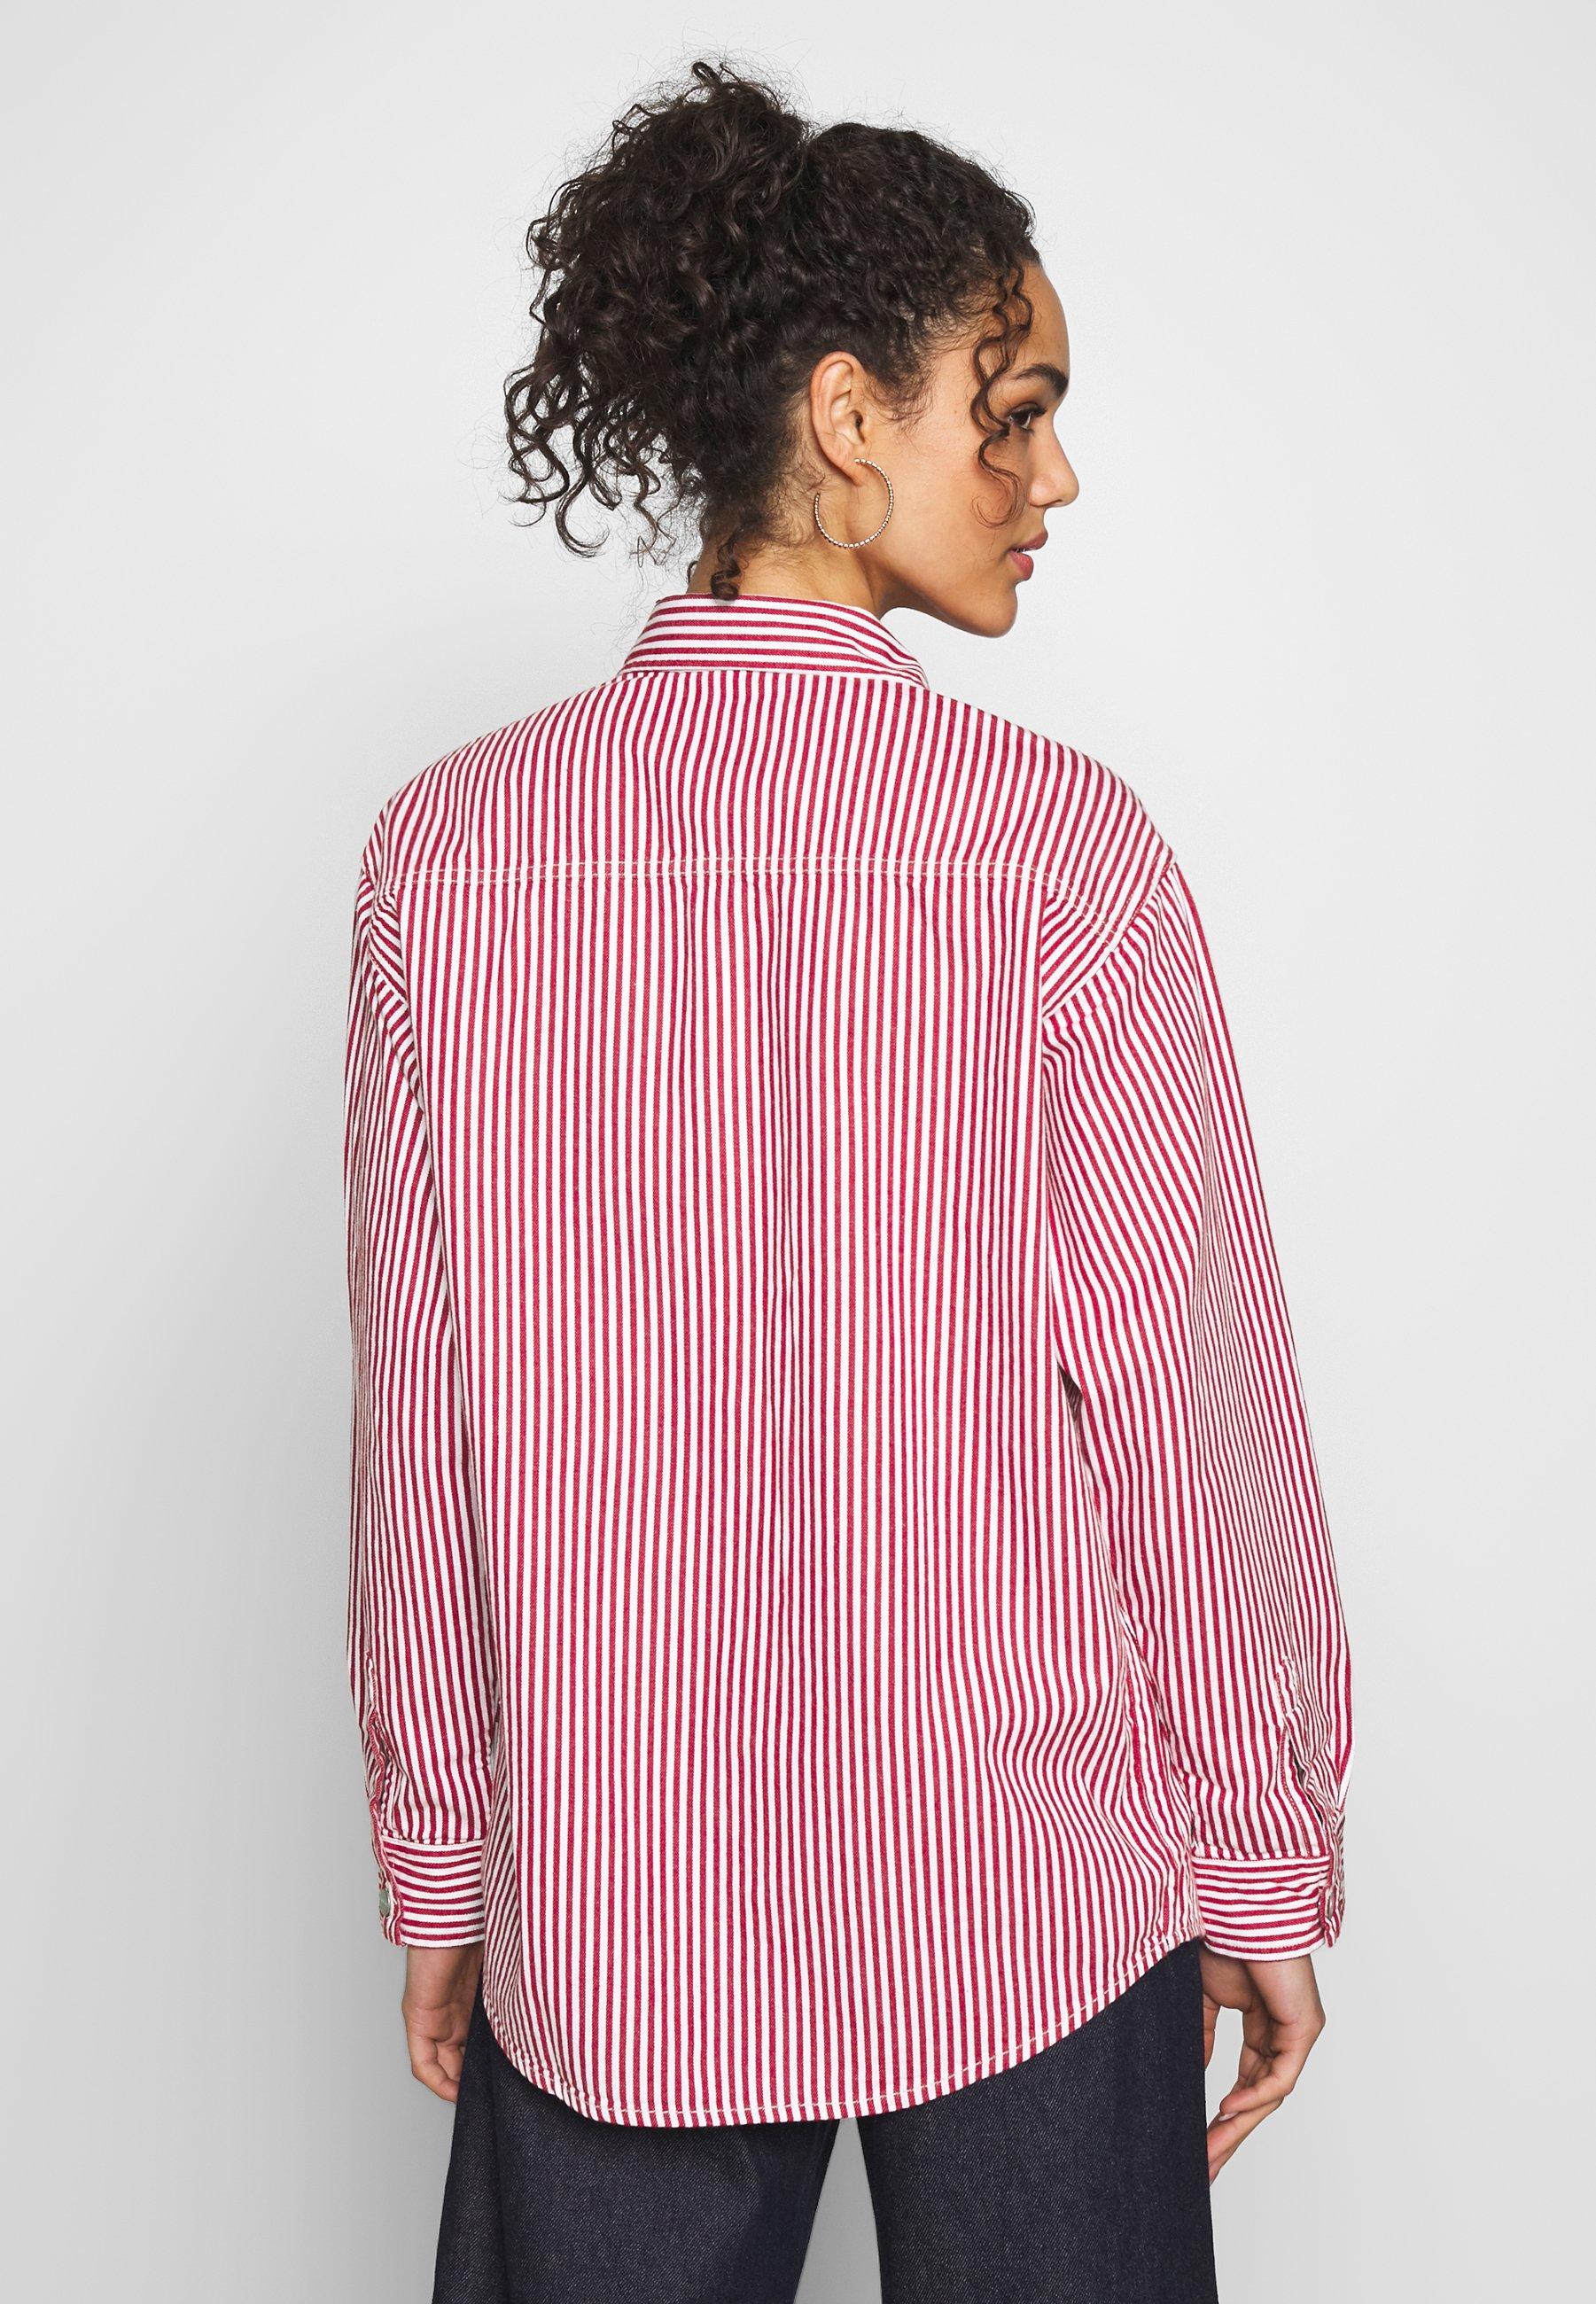 Carhartt WIP Skjorte - red/white